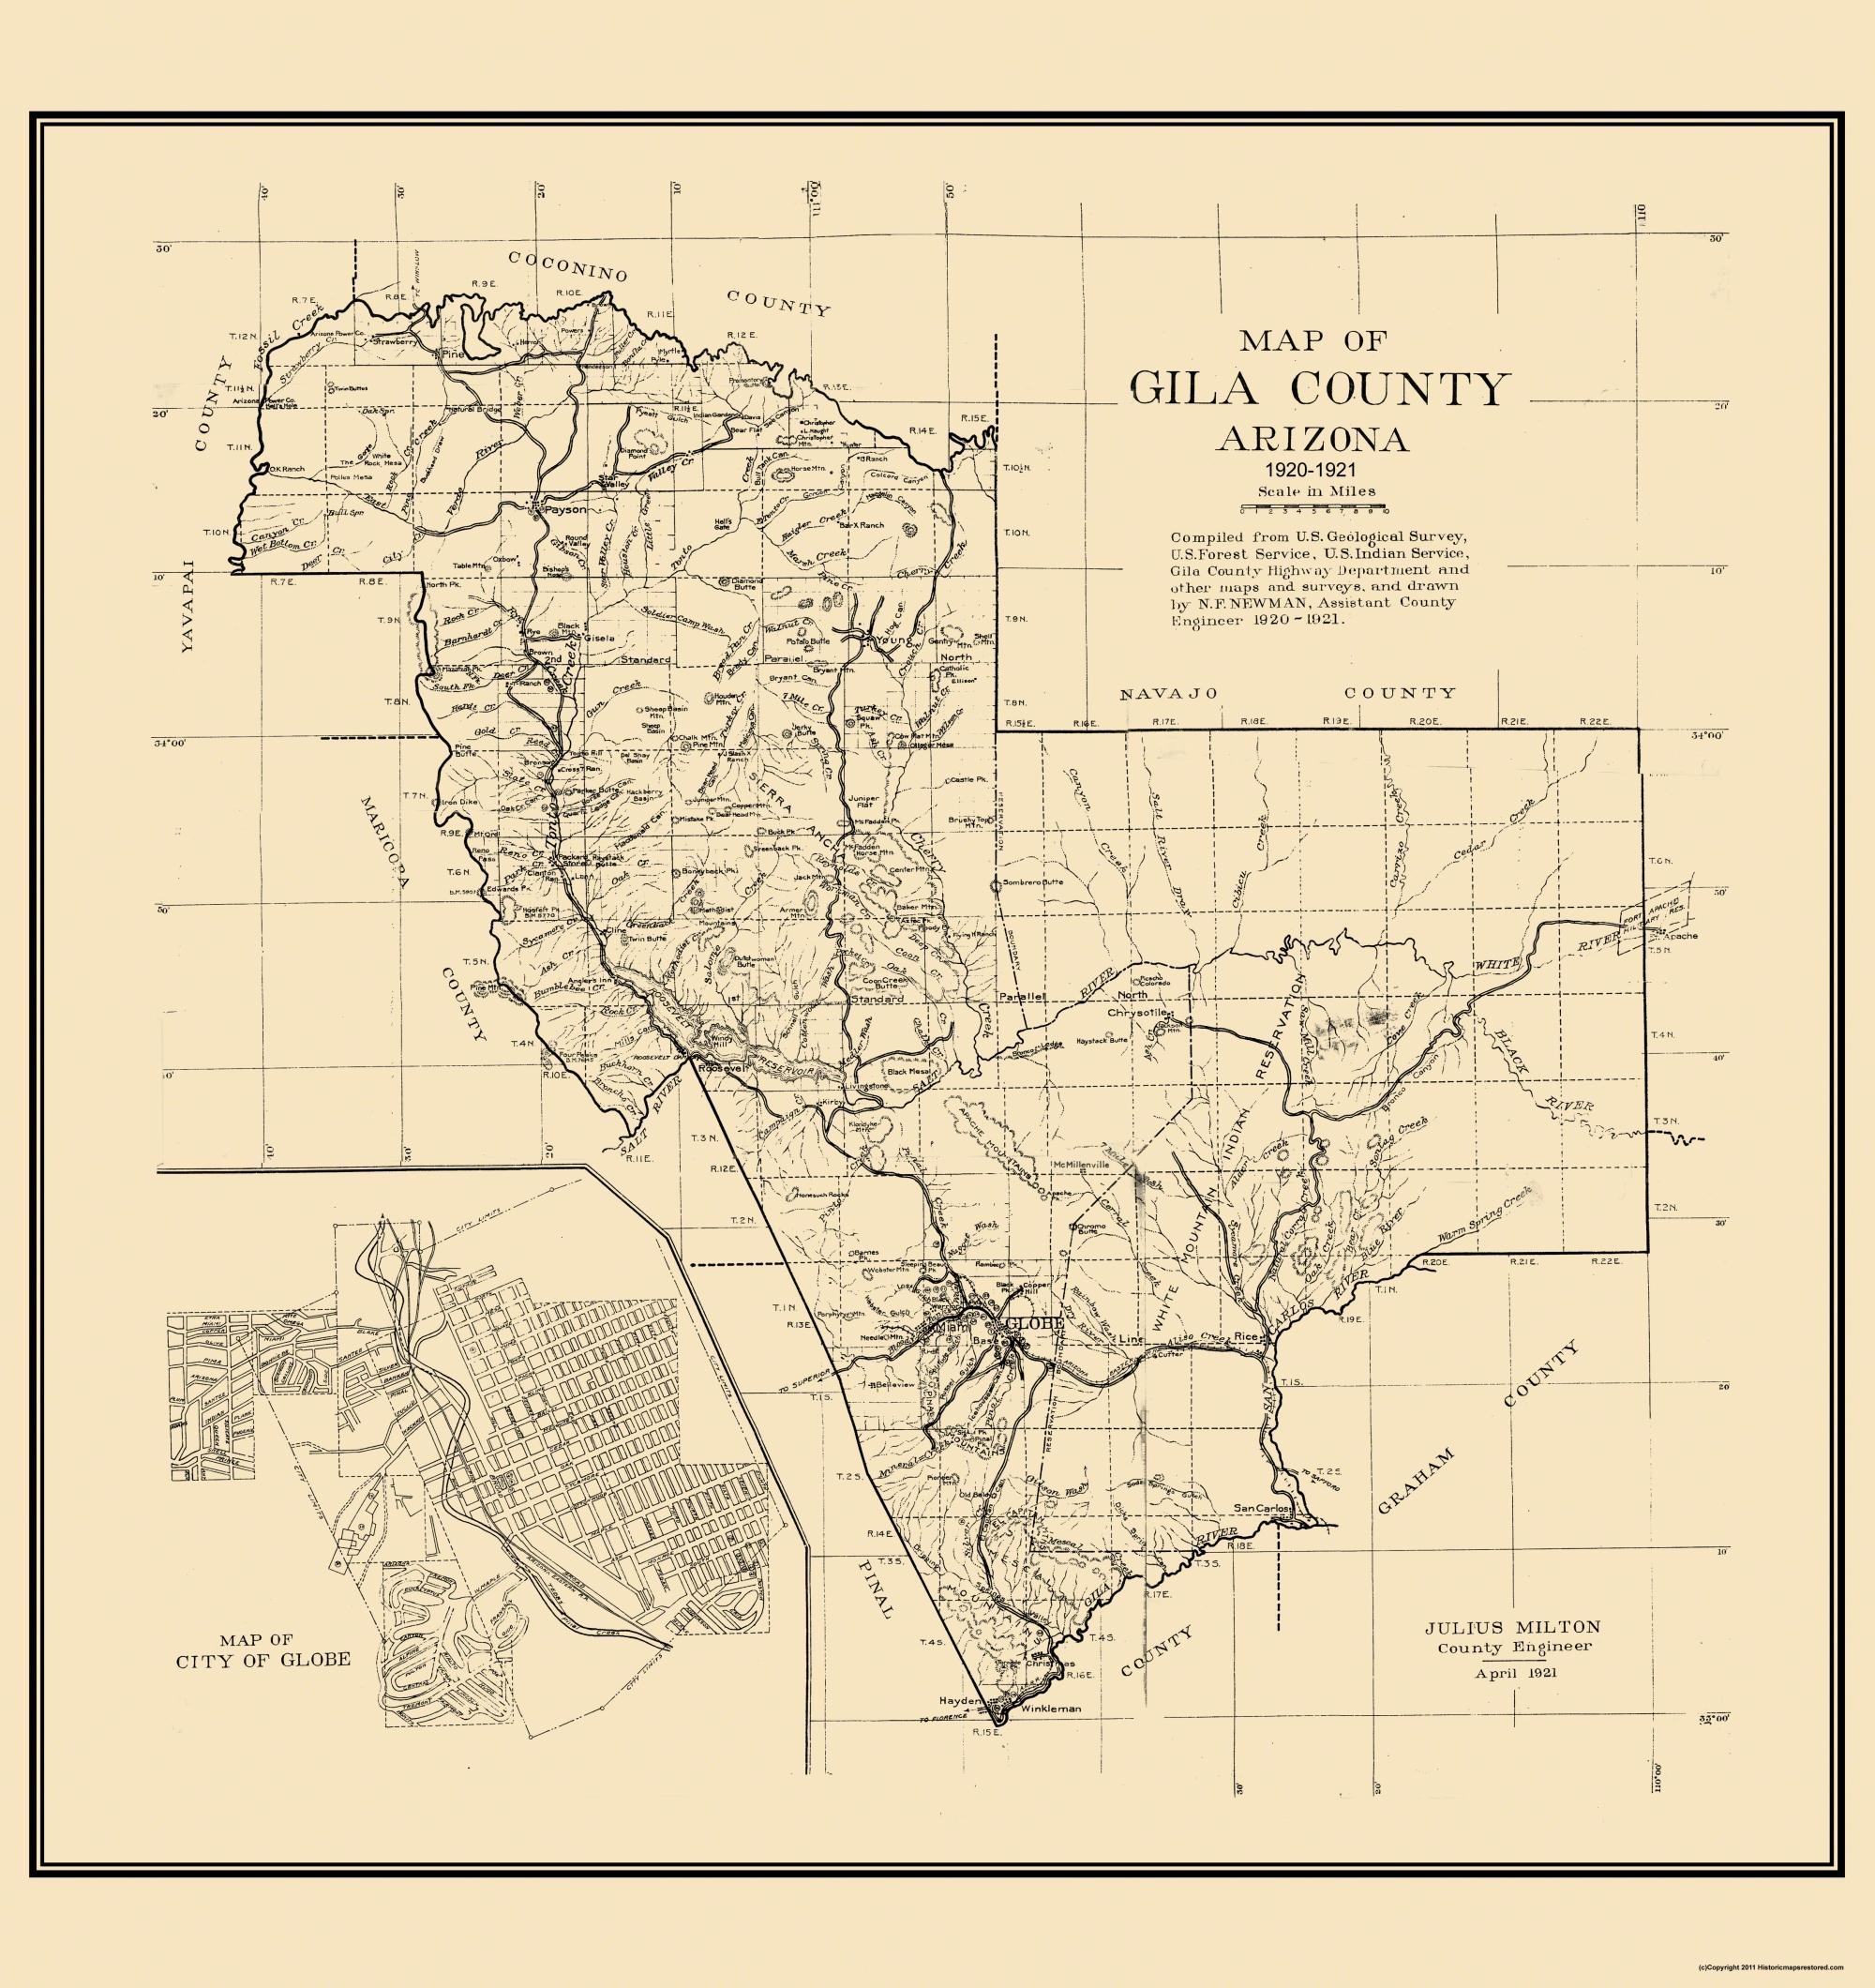 Arizona gila county young - Hover To Zoom